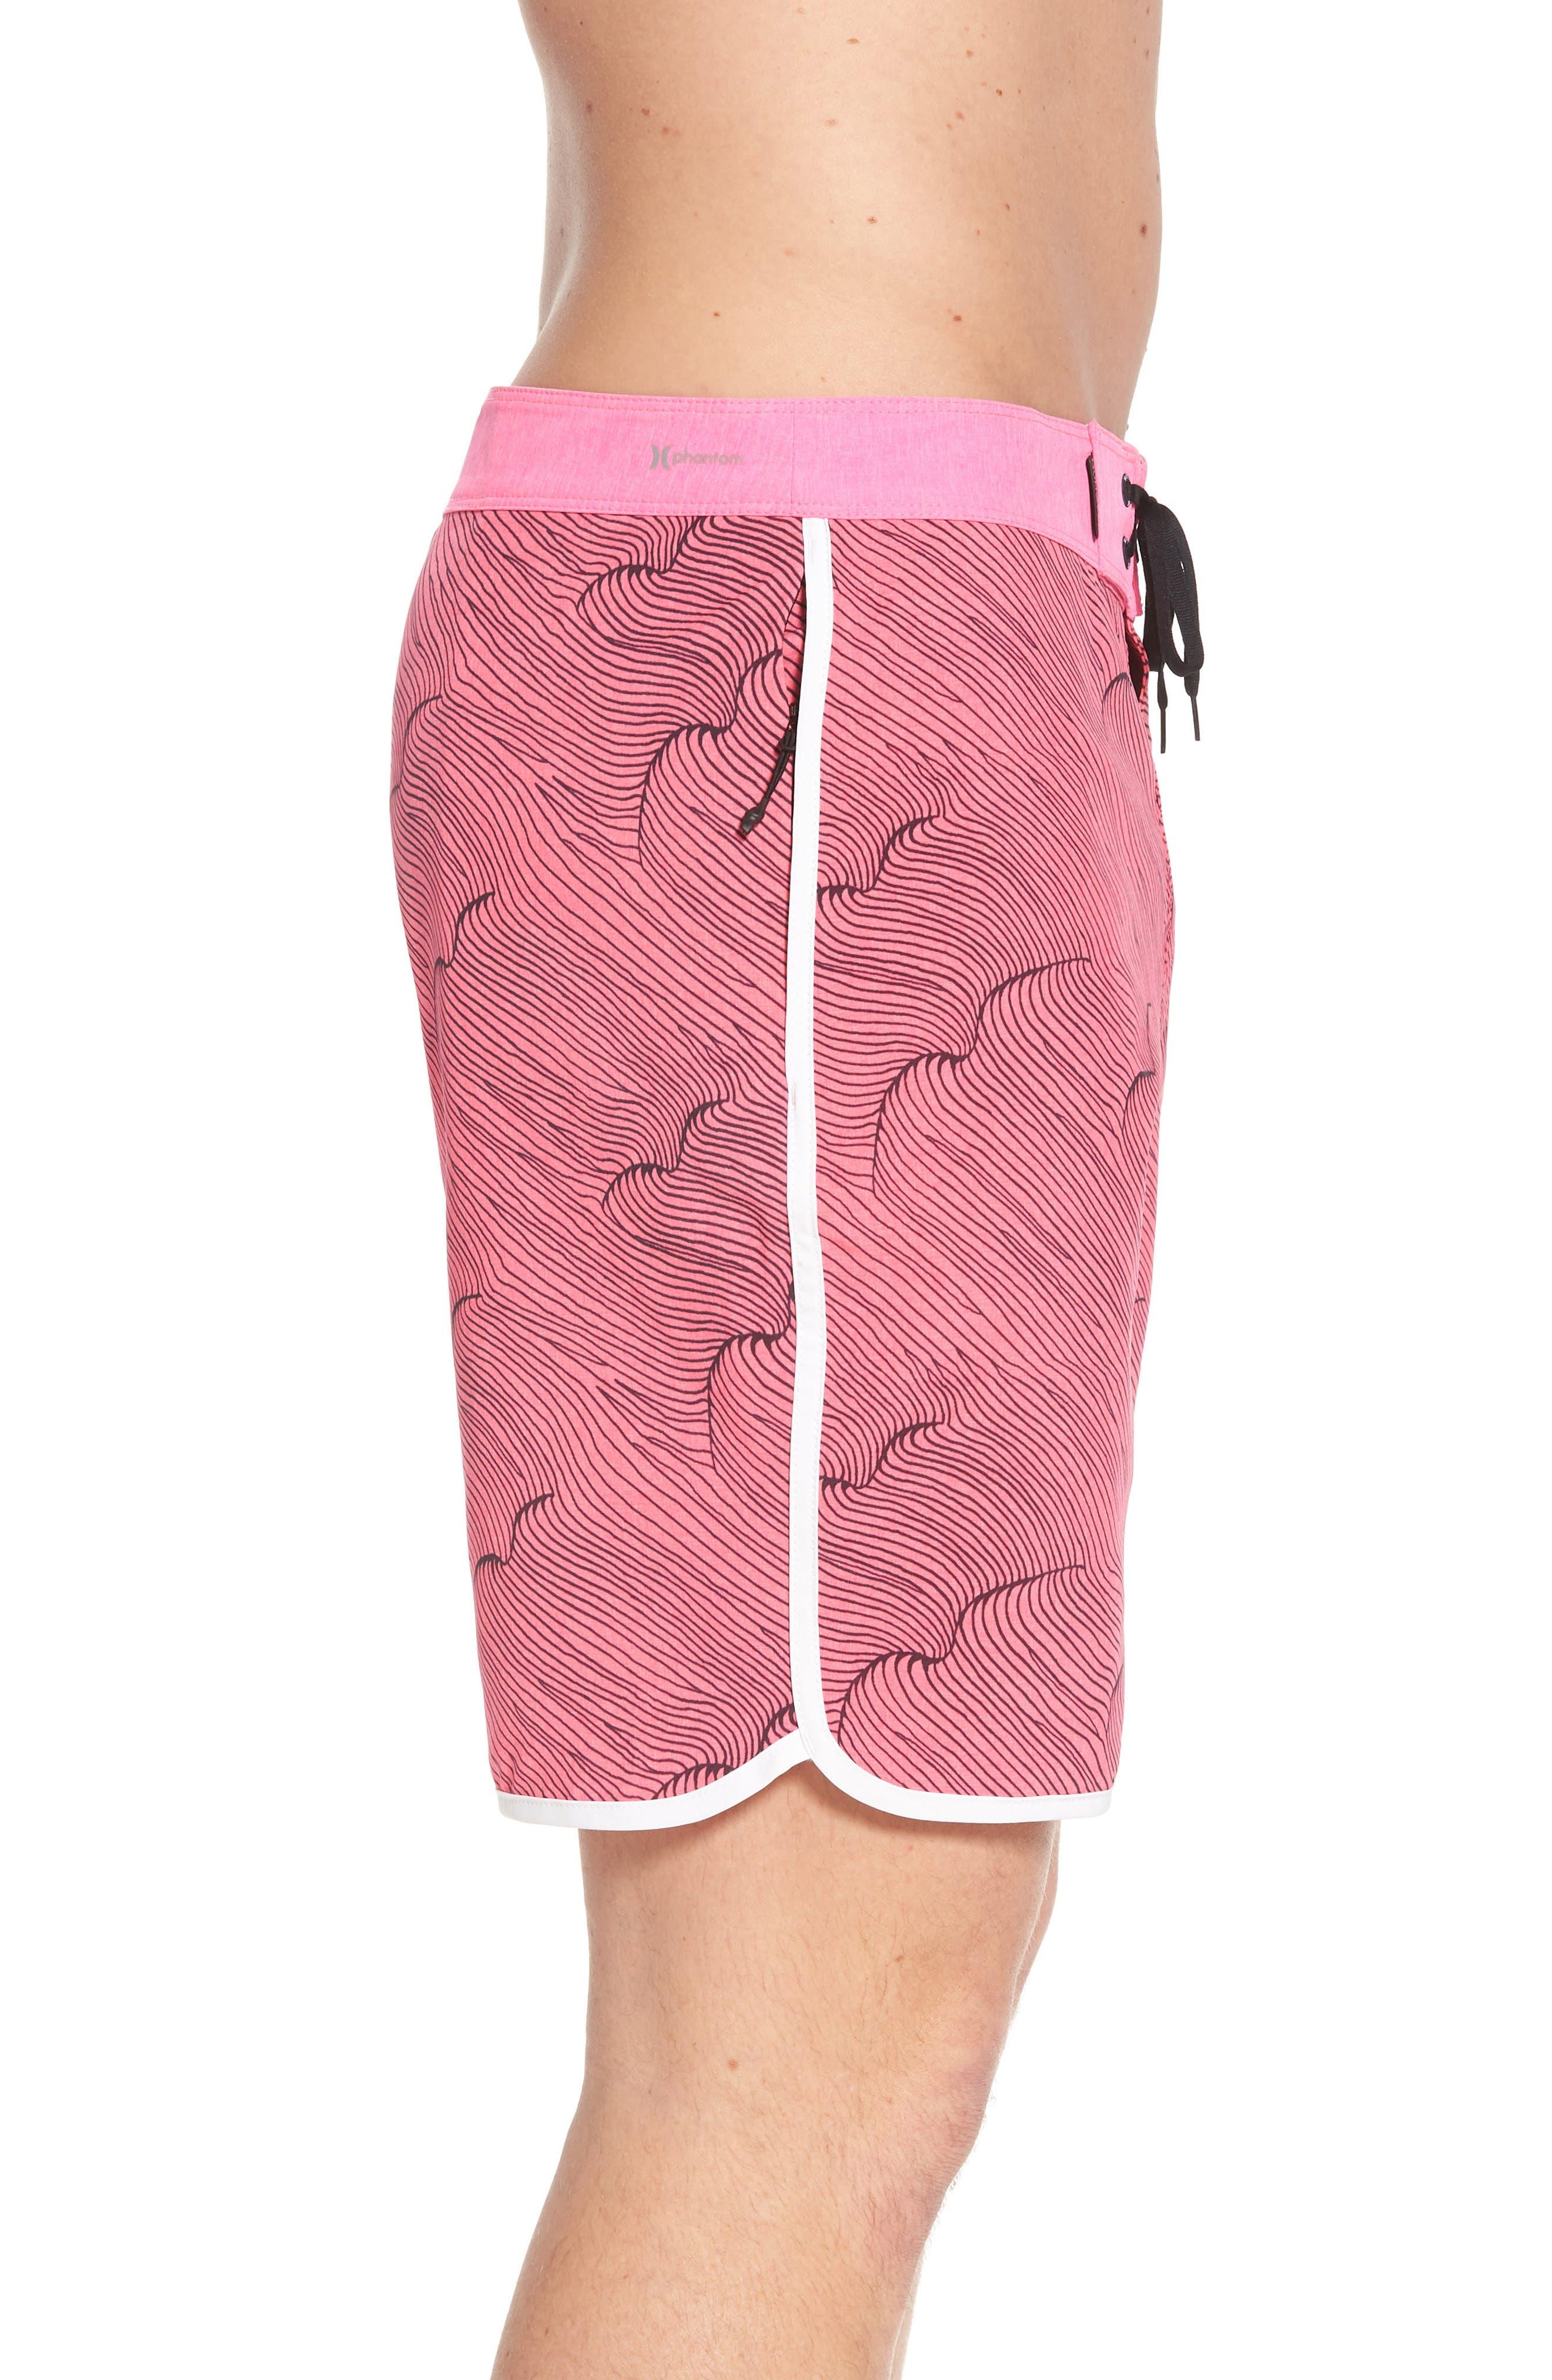 Phantom Thalia Street Board Shorts,                             Alternate thumbnail 3, color,                             Hyper Pink/Black